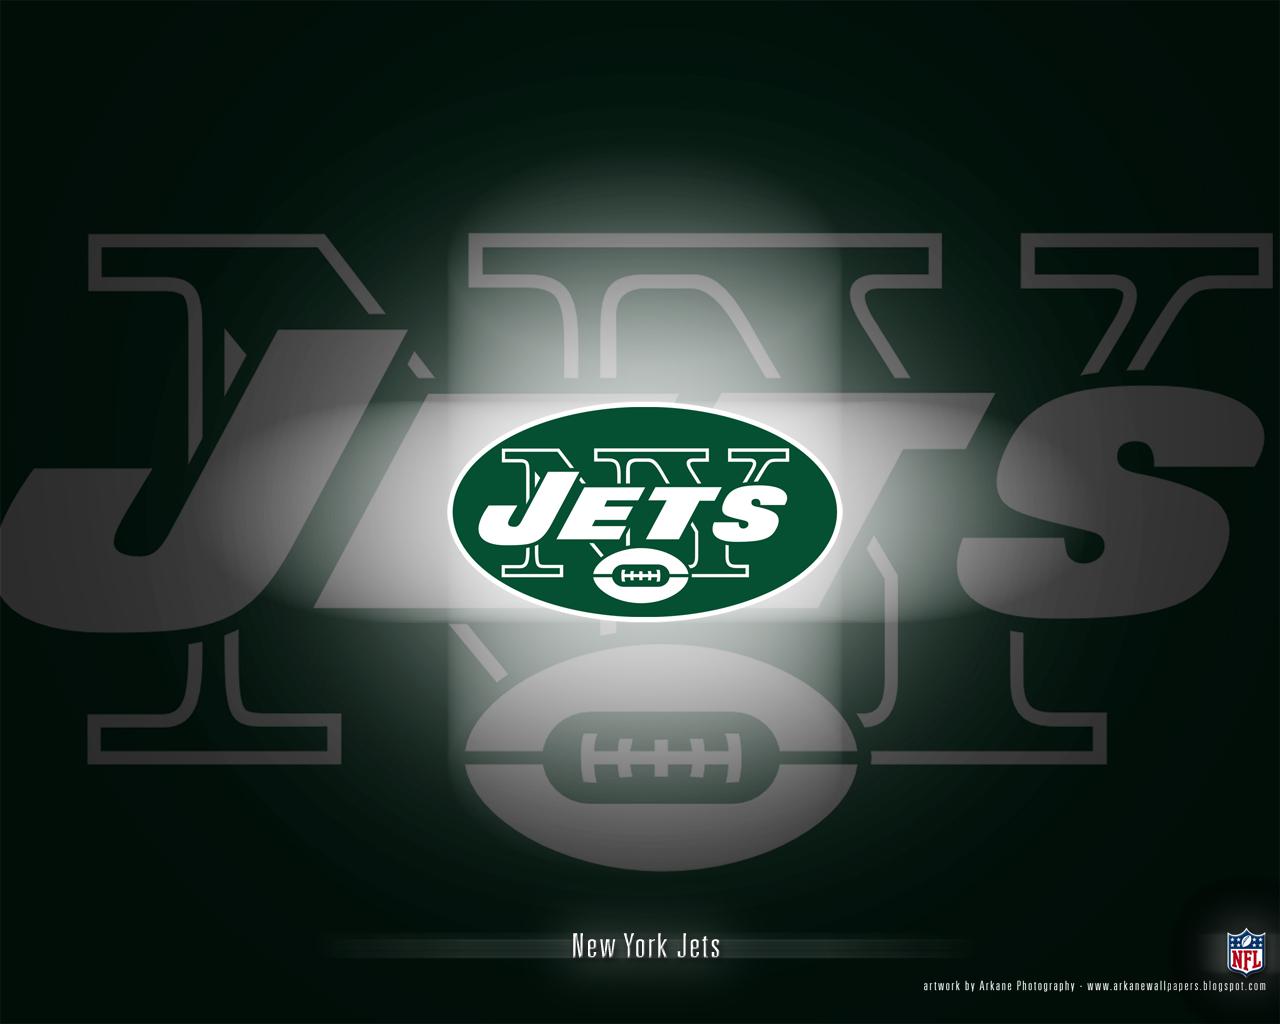 Arsenal Fc 3d Wallpapers New York Jets Wallpaper 1280x1024 73374